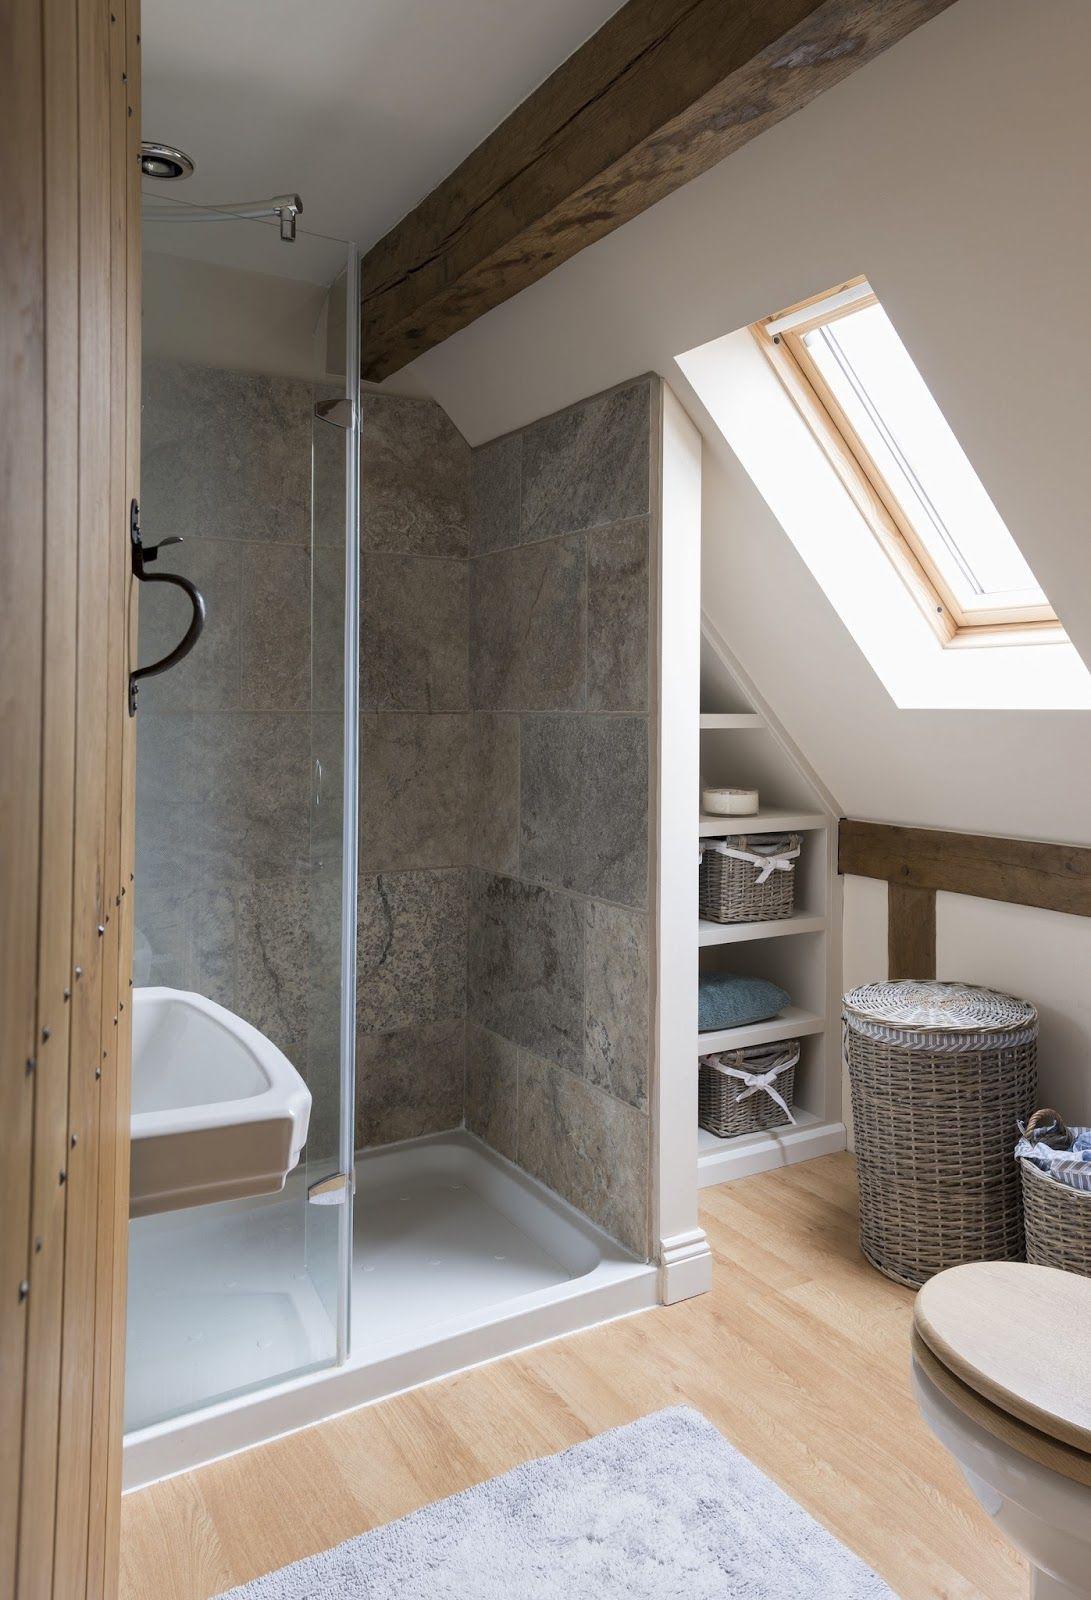 Small window ideas bathrooms  from little acorns  bathrooms  pinterest  june lofts